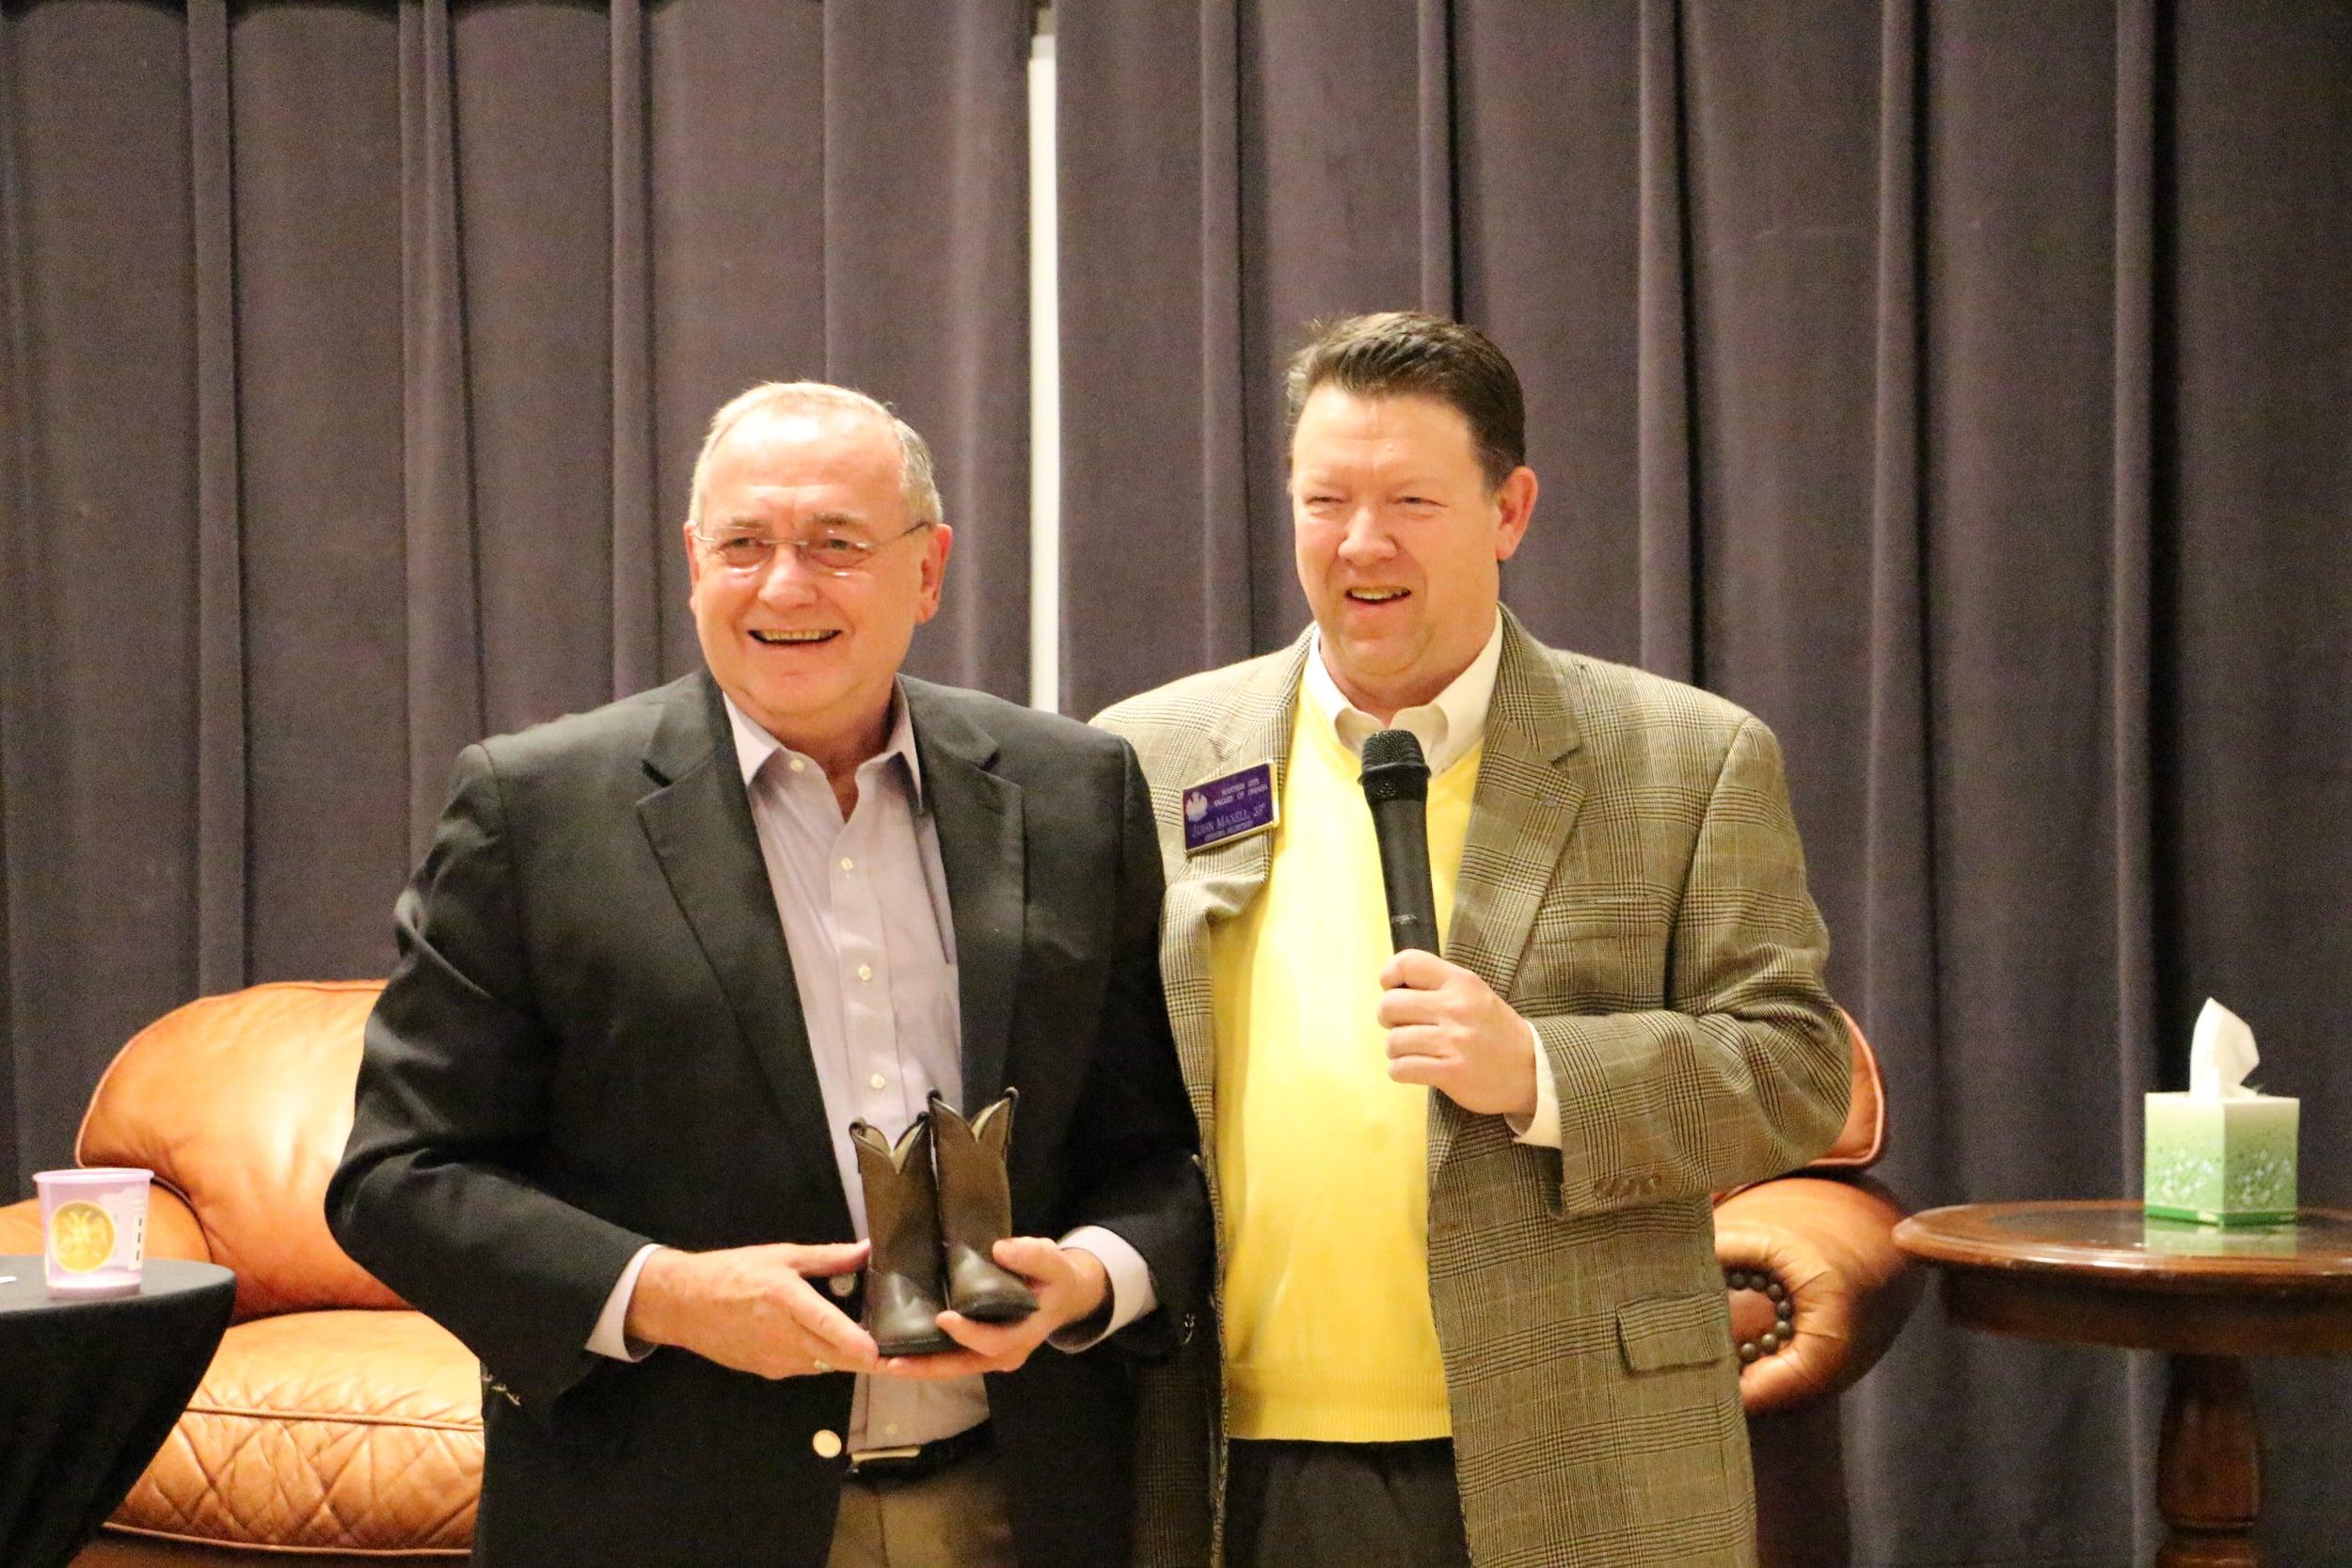 Curt Edic and John Maxell